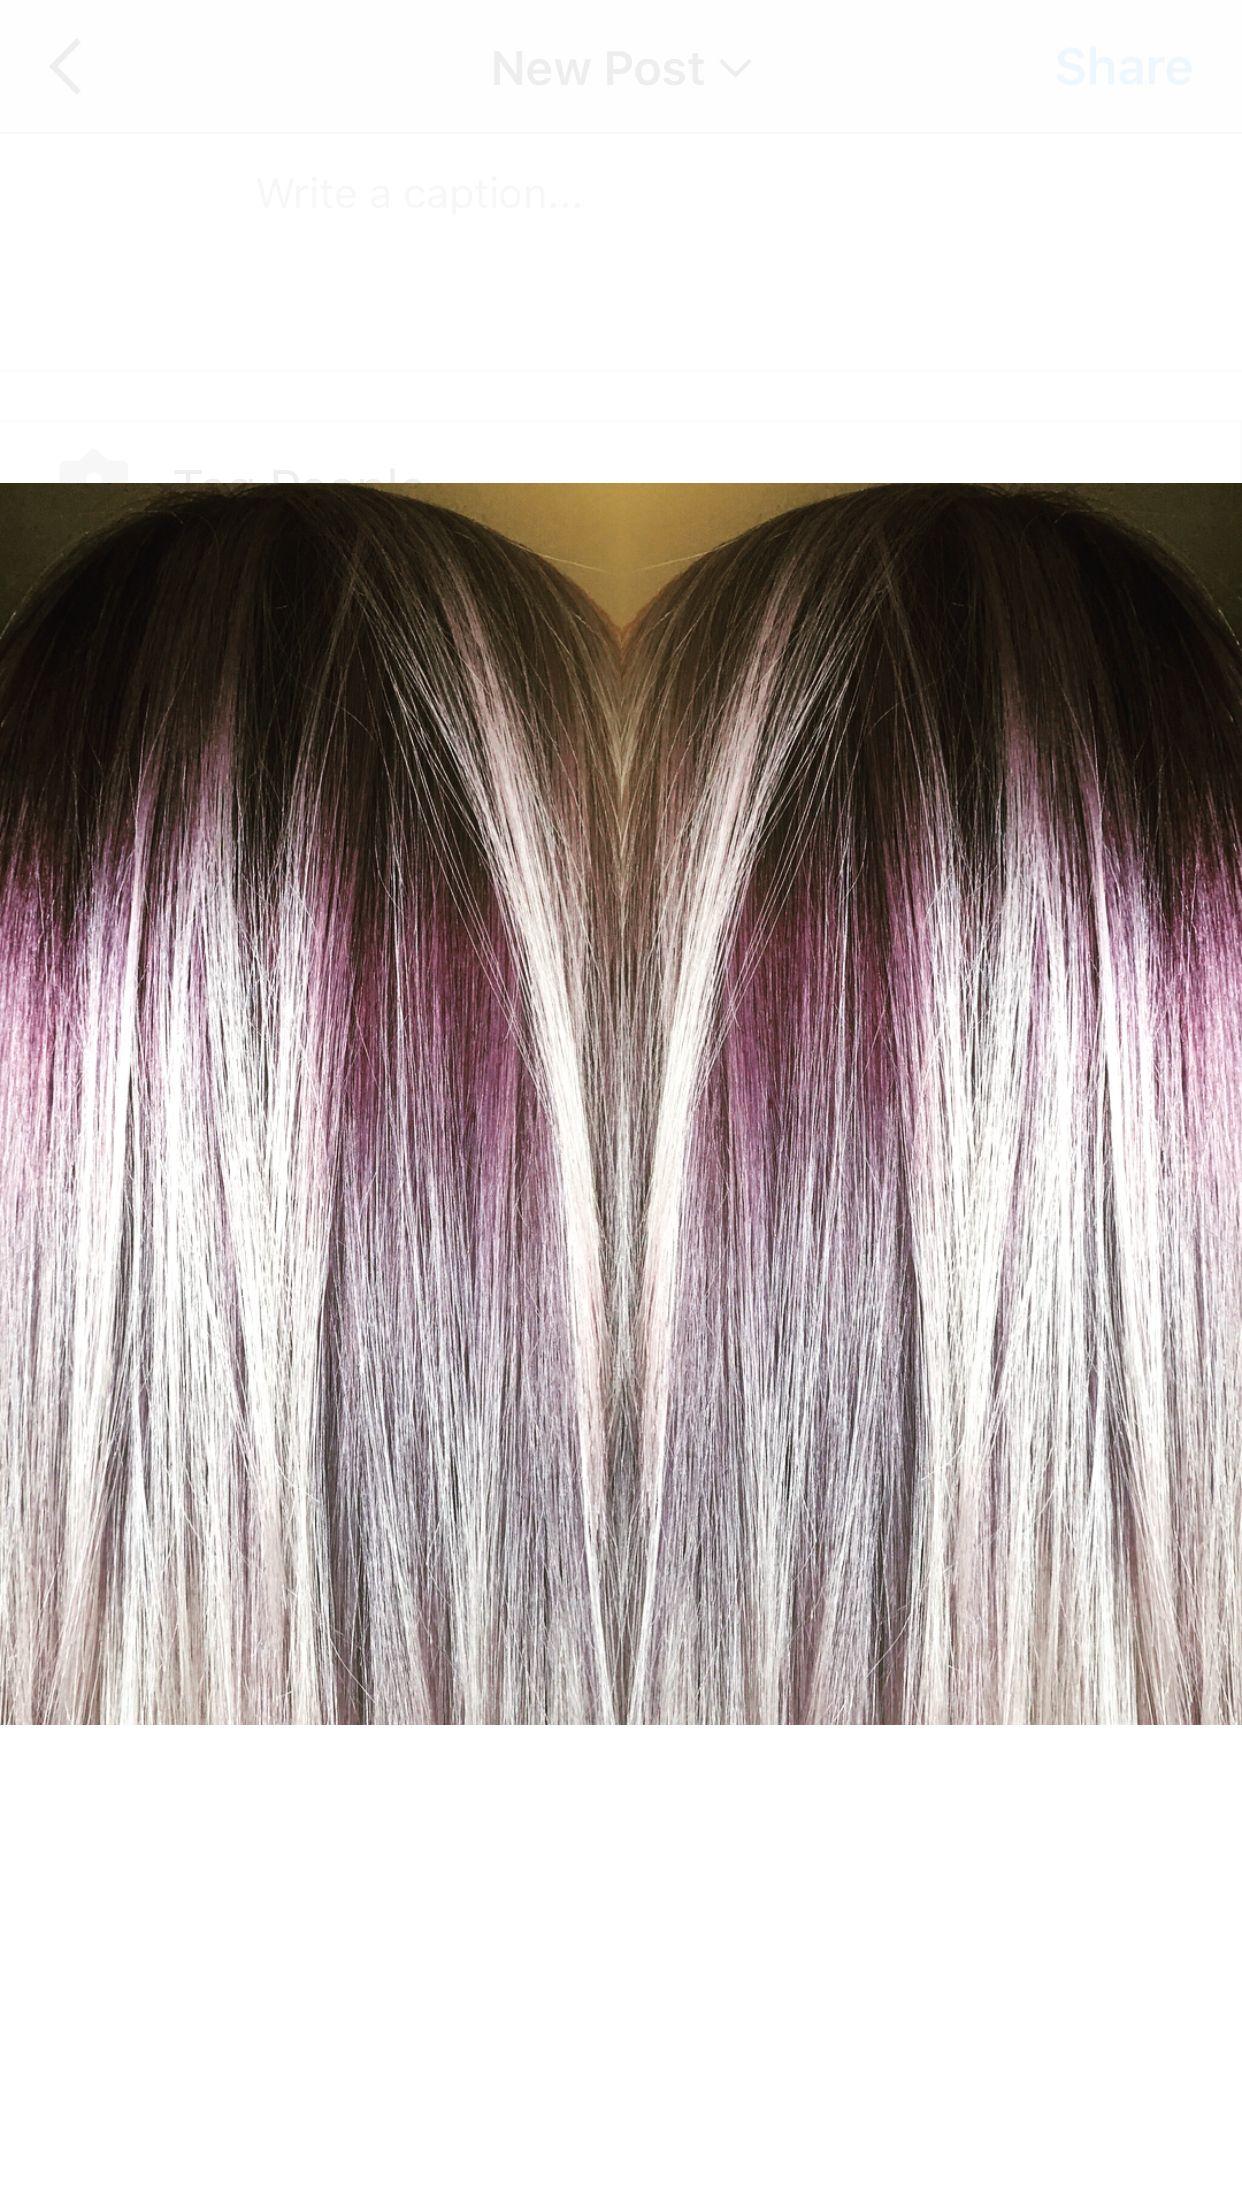 Red Violet Shadow Root On Platinum Blonde Hair Hairbyhaileykilpatrick Jdrakesalon Red Roots Blonde Hair Red Violet Hair Blonde Hair With Roots